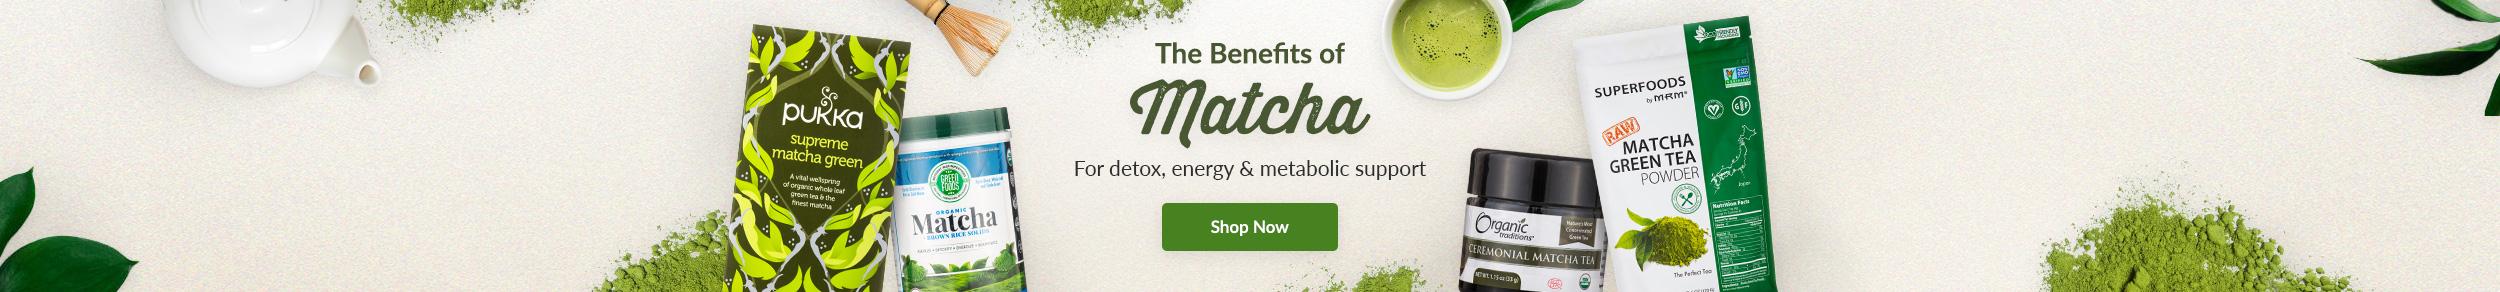 https://i3.pureformulas.net/images/static/Generic-benefits-Matcha_011419.jpg